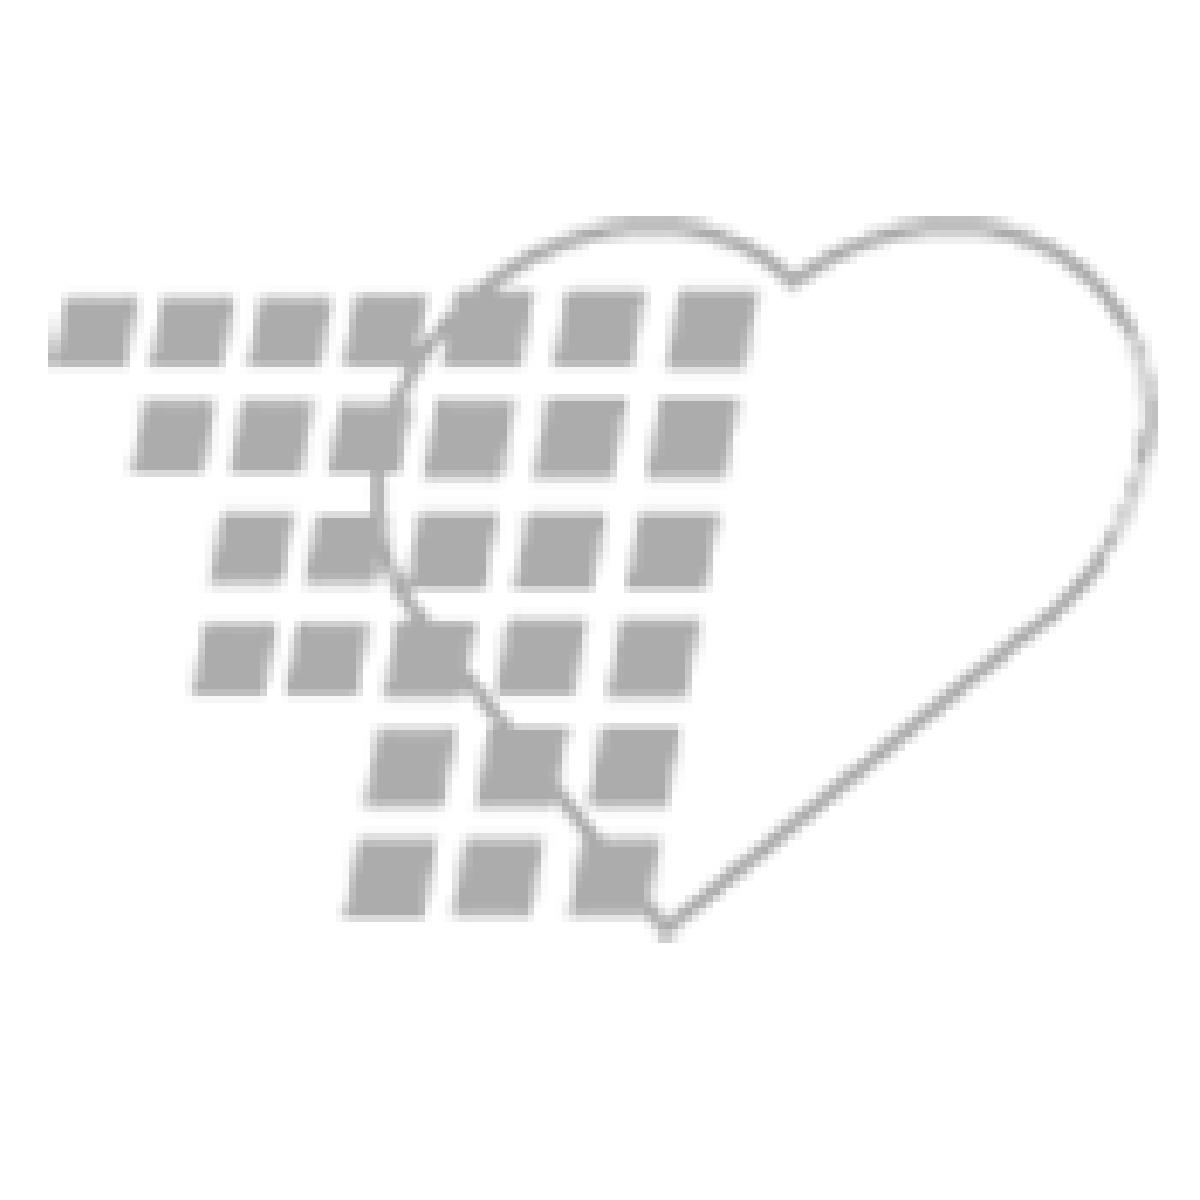 06-93-3124 - Demo Dose® Influenza Virus Vaccine (Flulaval) 0.5mL 5mL